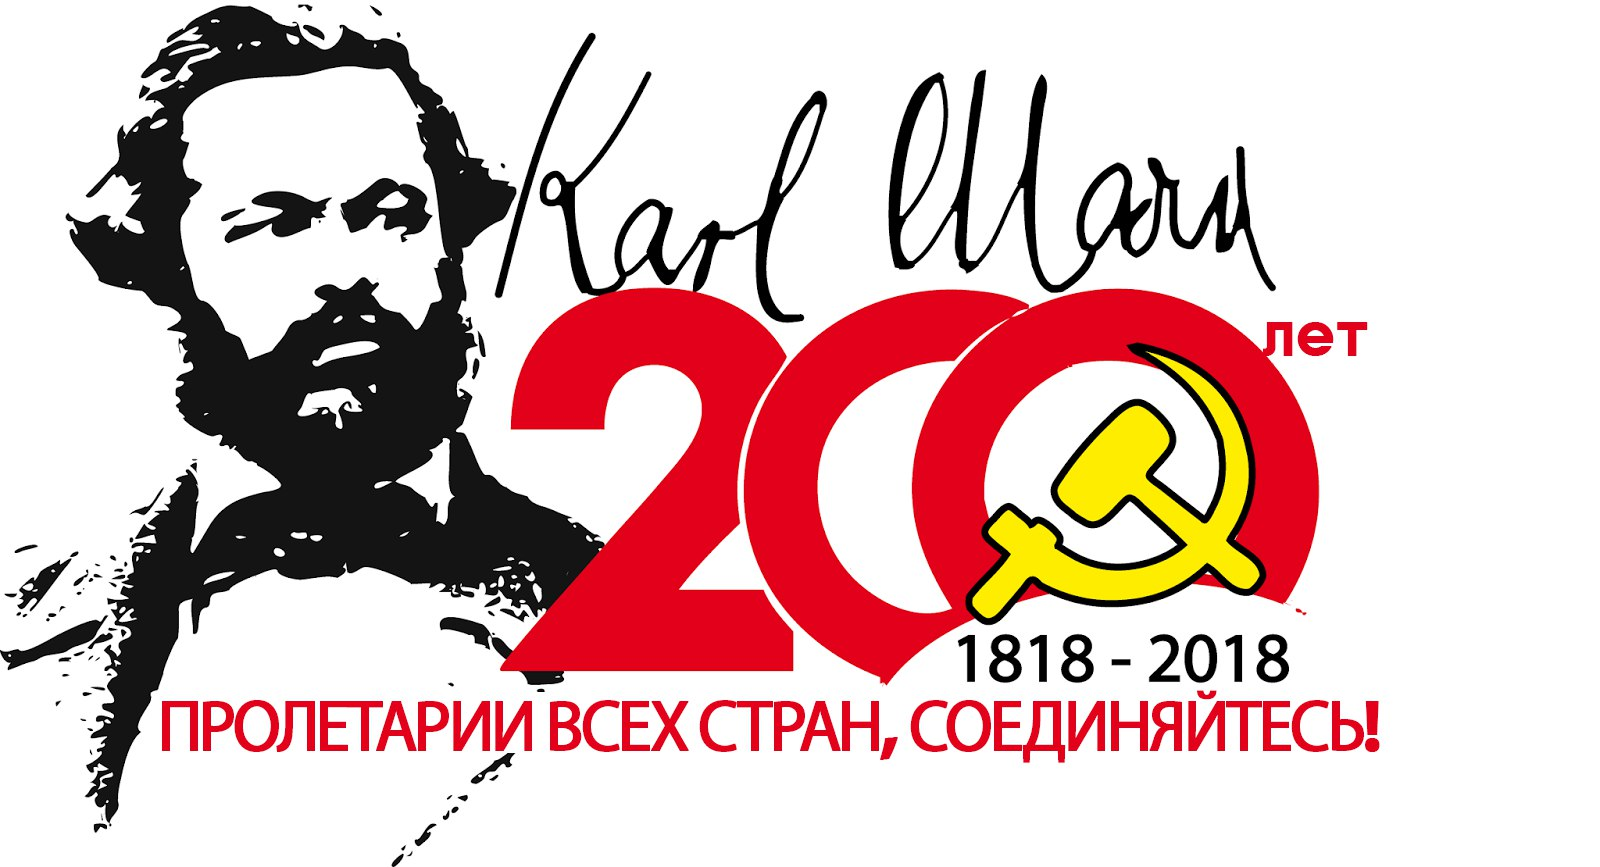 http://kprf-chel.ru/wp-content/uploads/2018/05/mn8nytitfp8.jpg